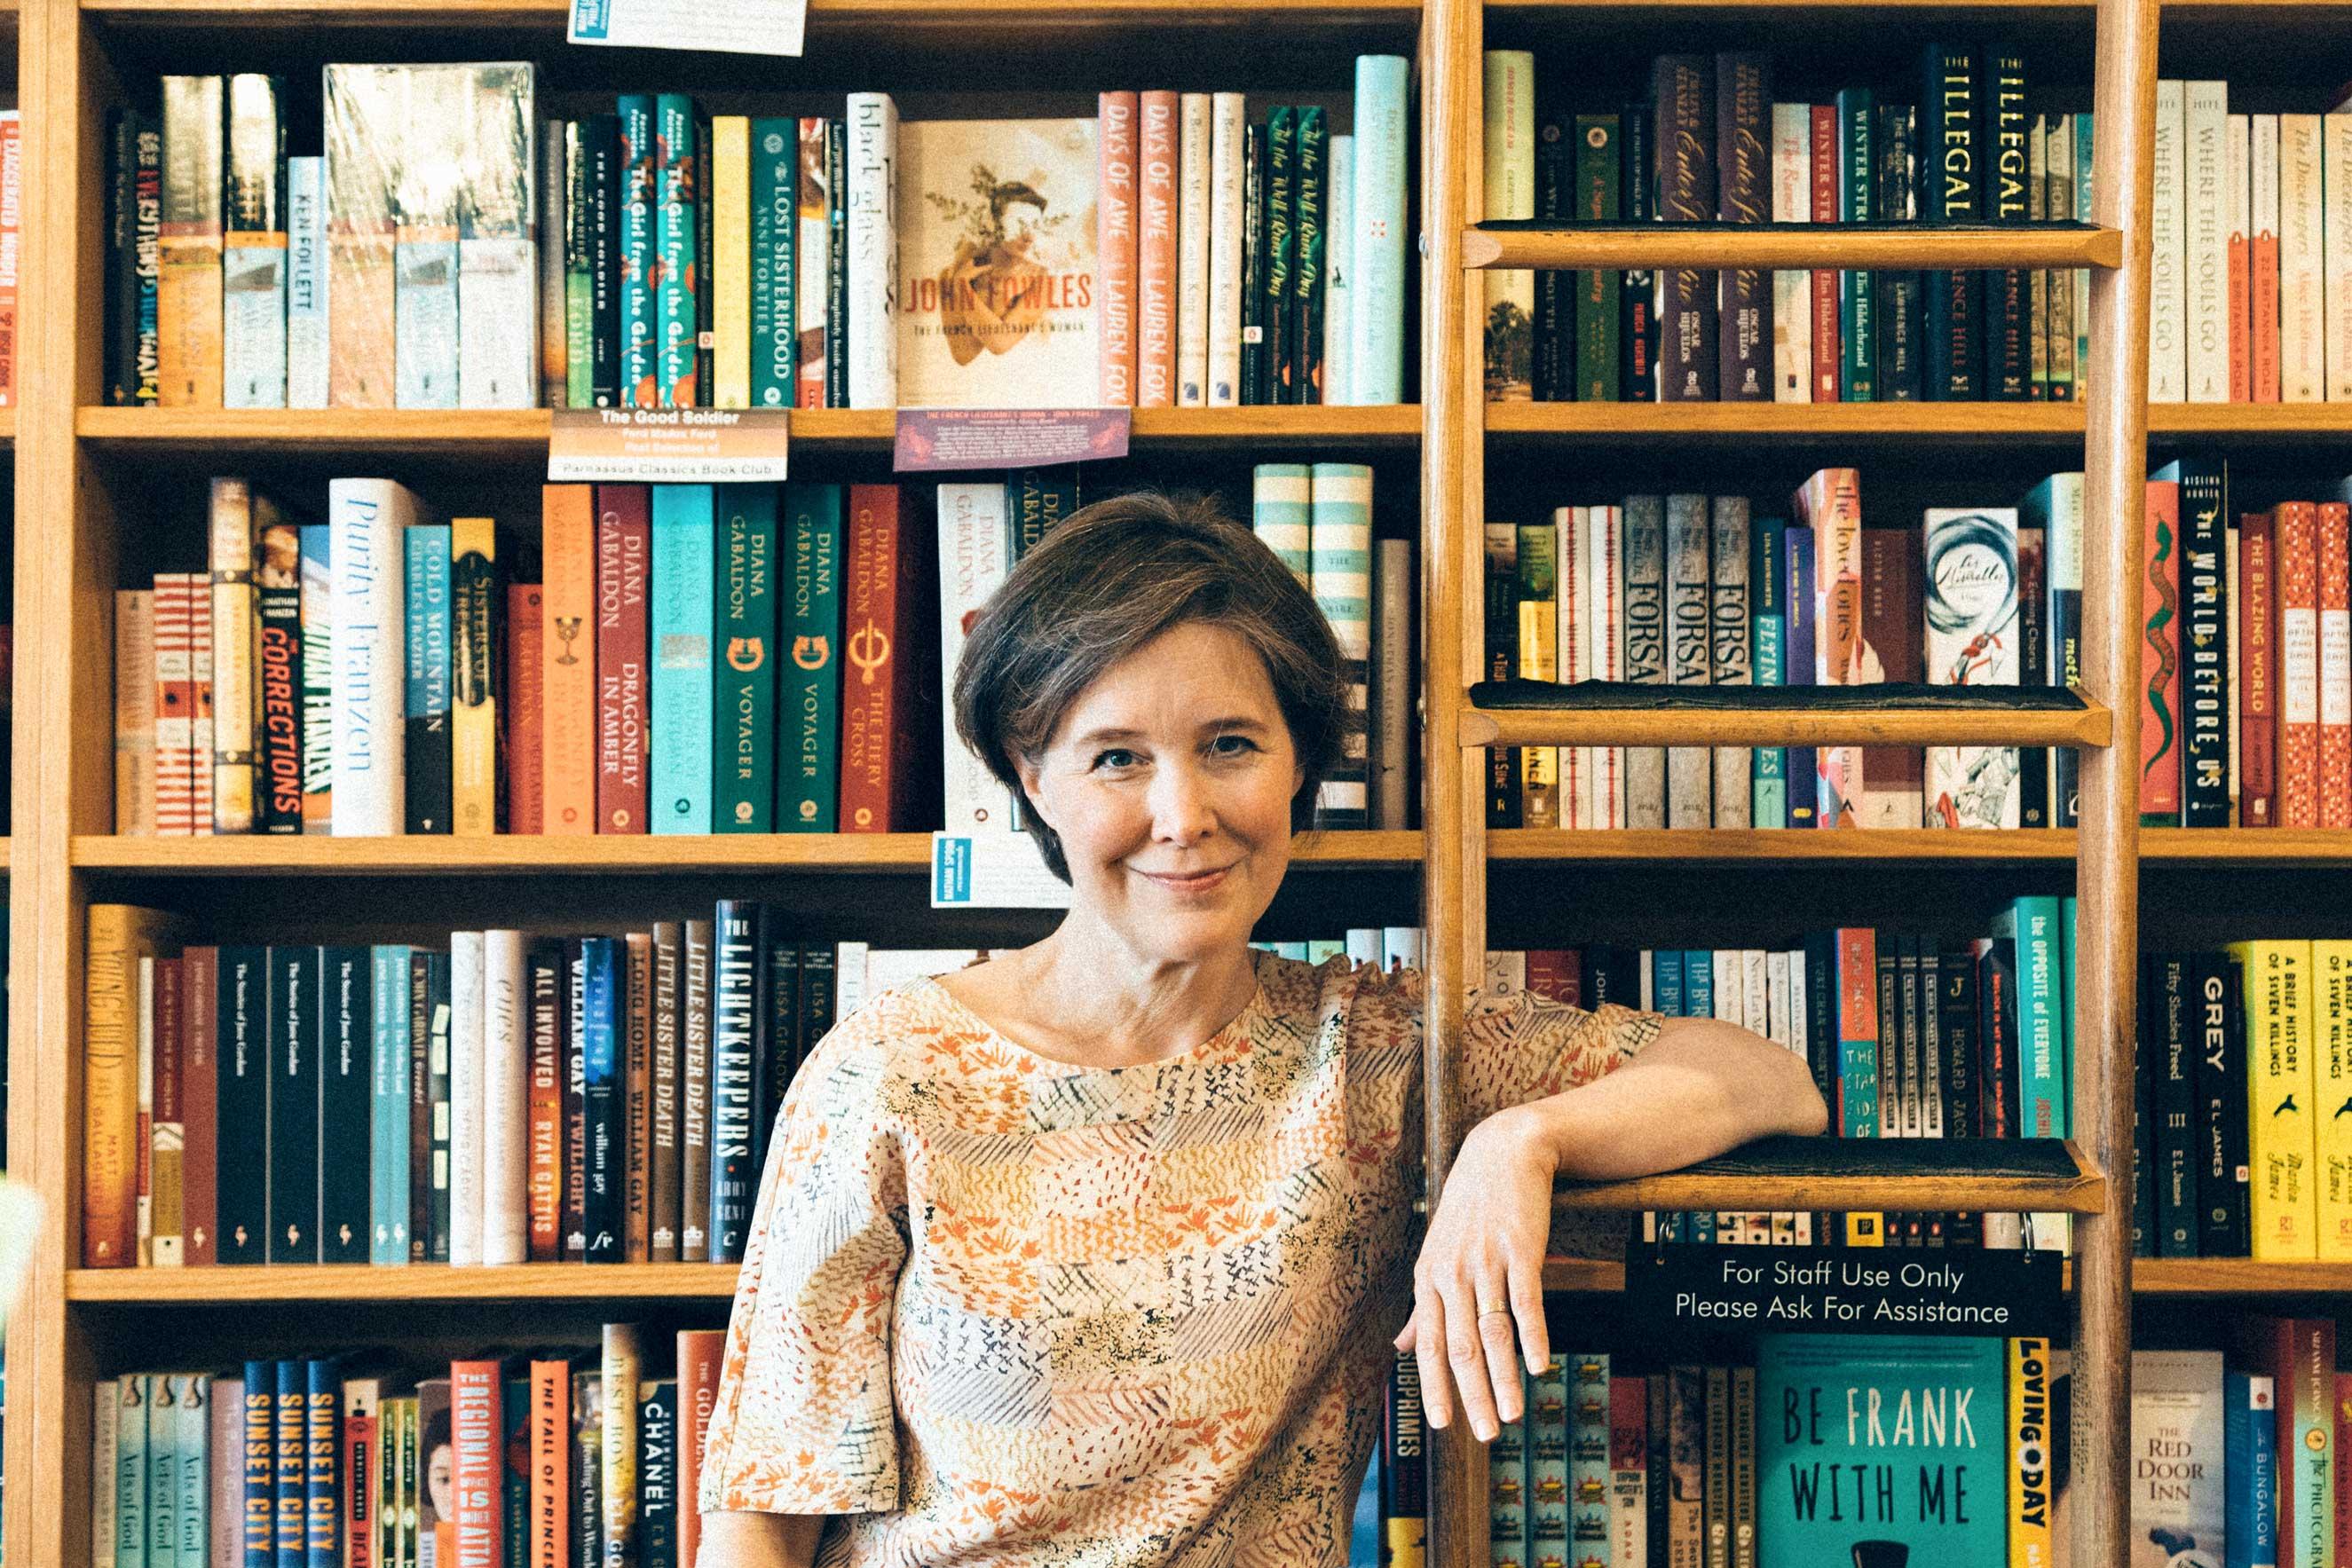 Portrait of author Ann Patchett in her bookstore, Parnassus Books, in Nasville on 15 April 2016